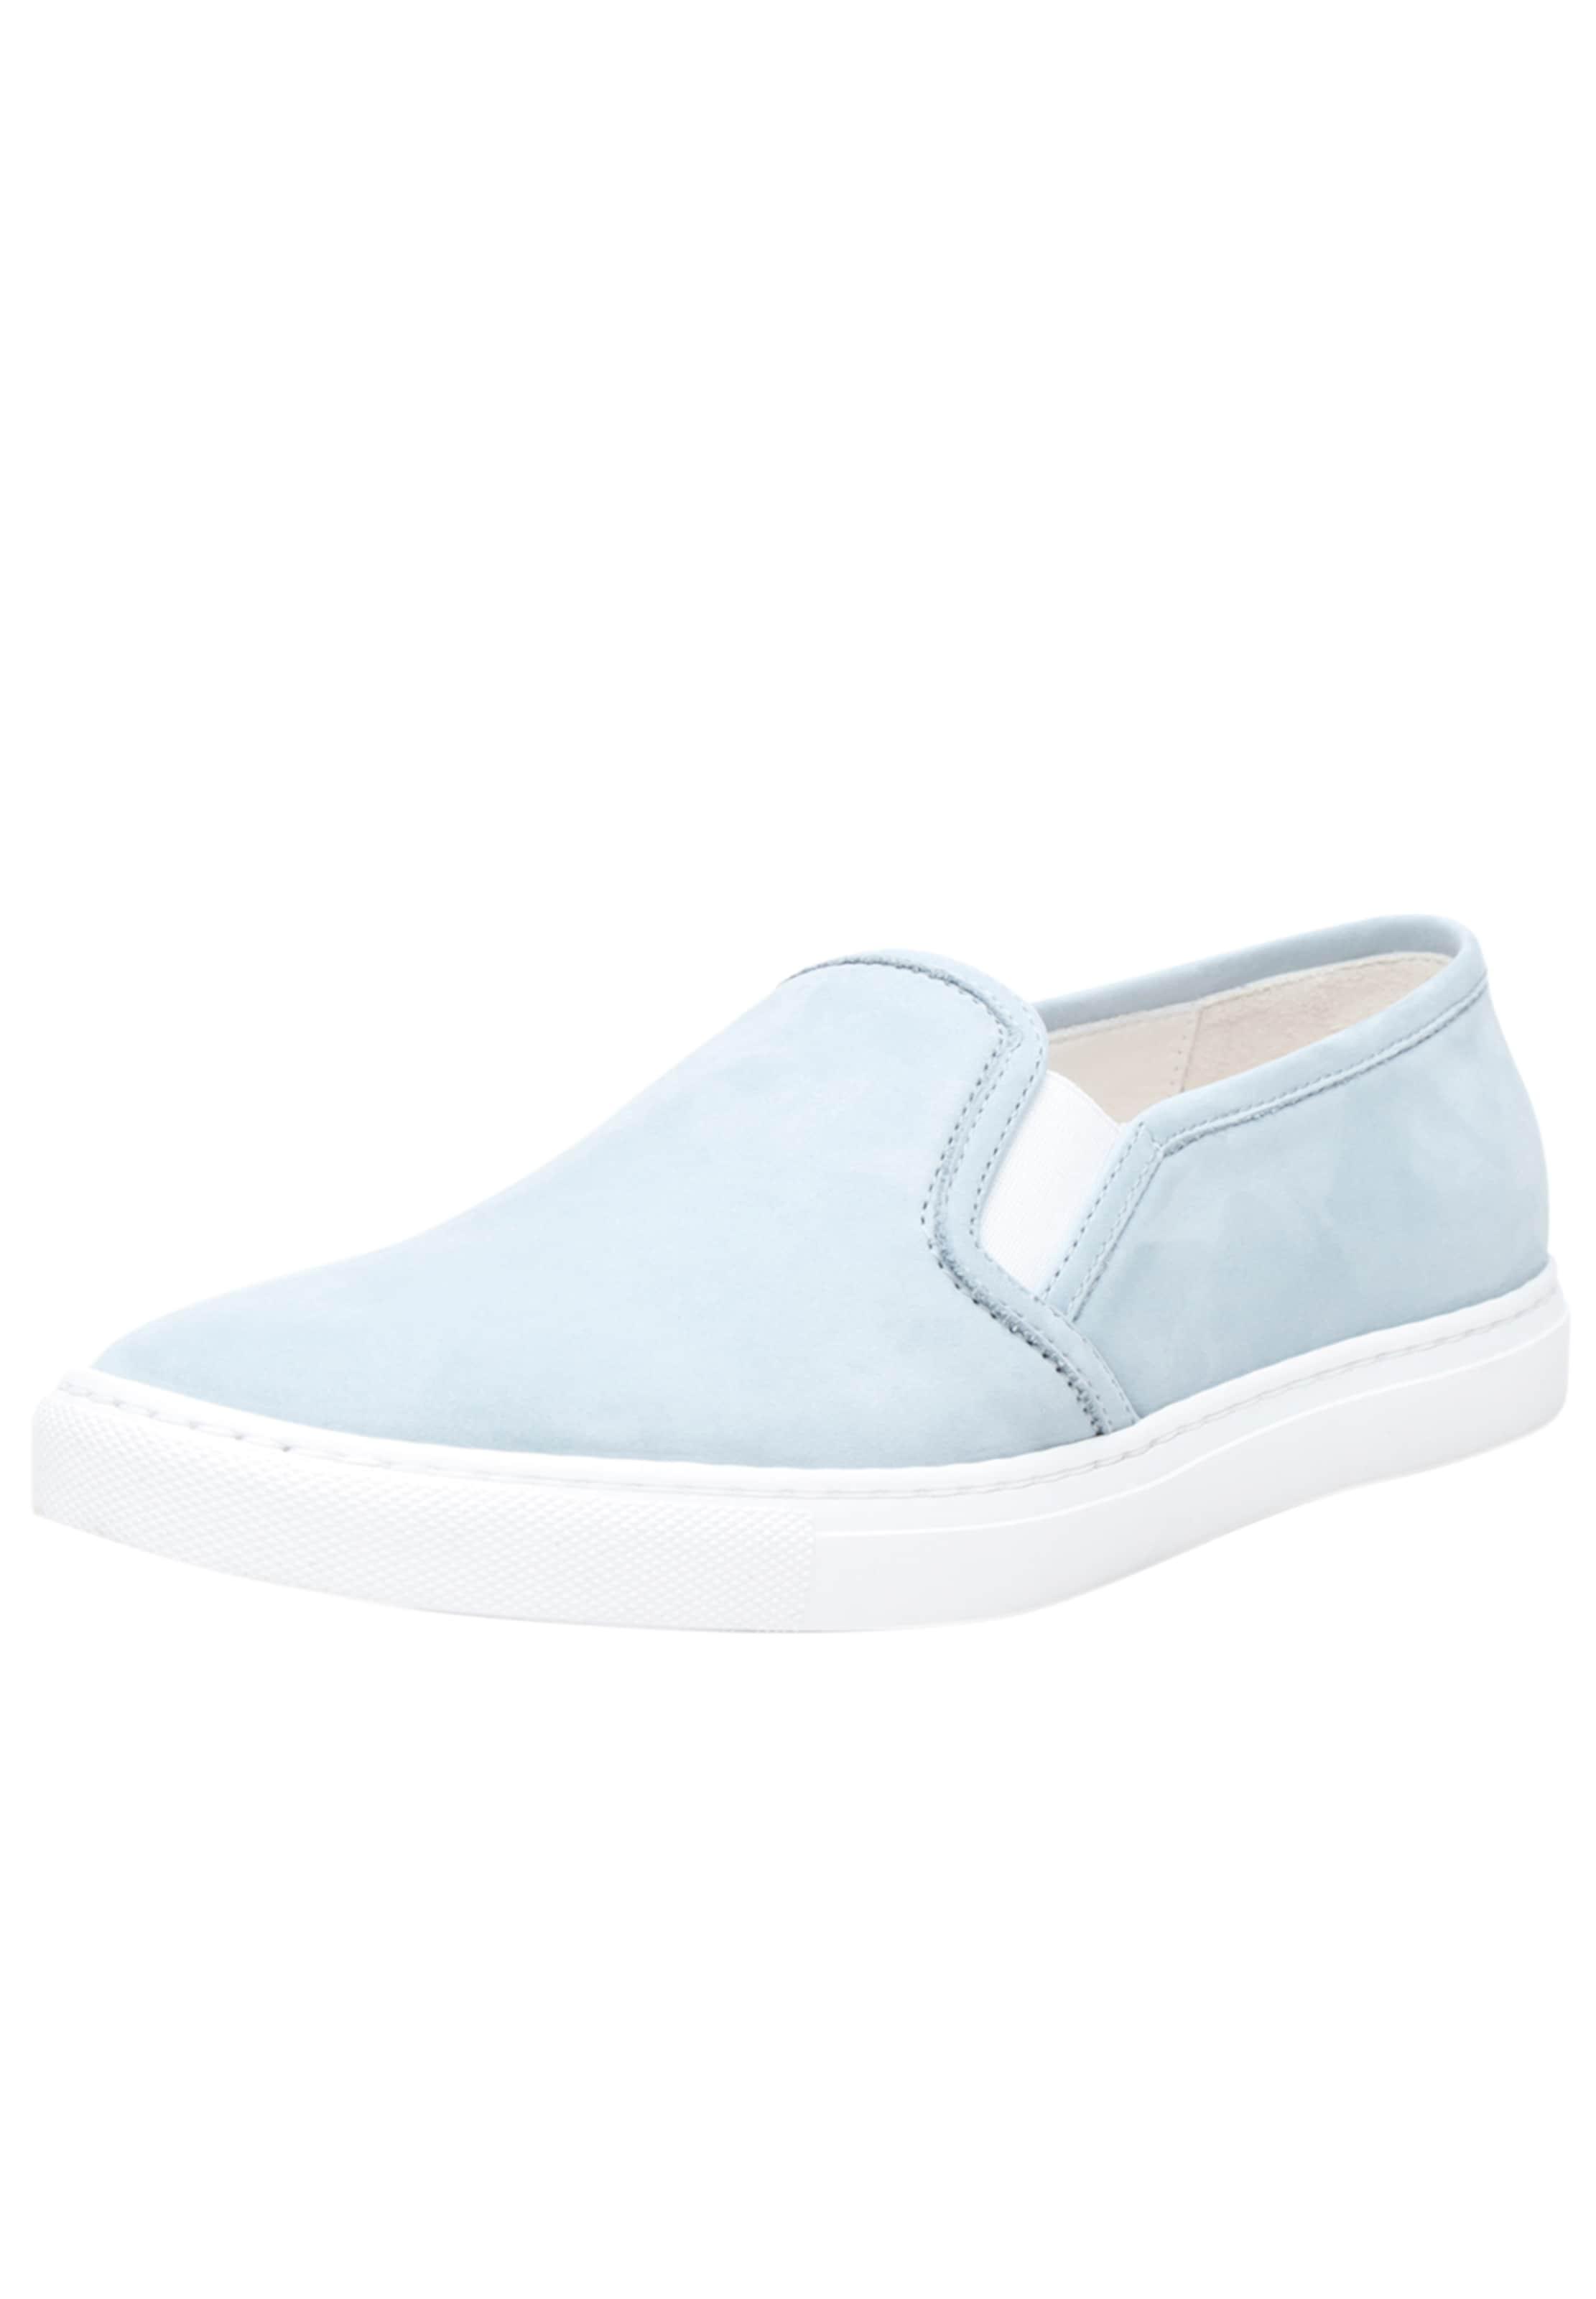 SHOEPASSION Sneaker No. 22 WS Hohe Qualität